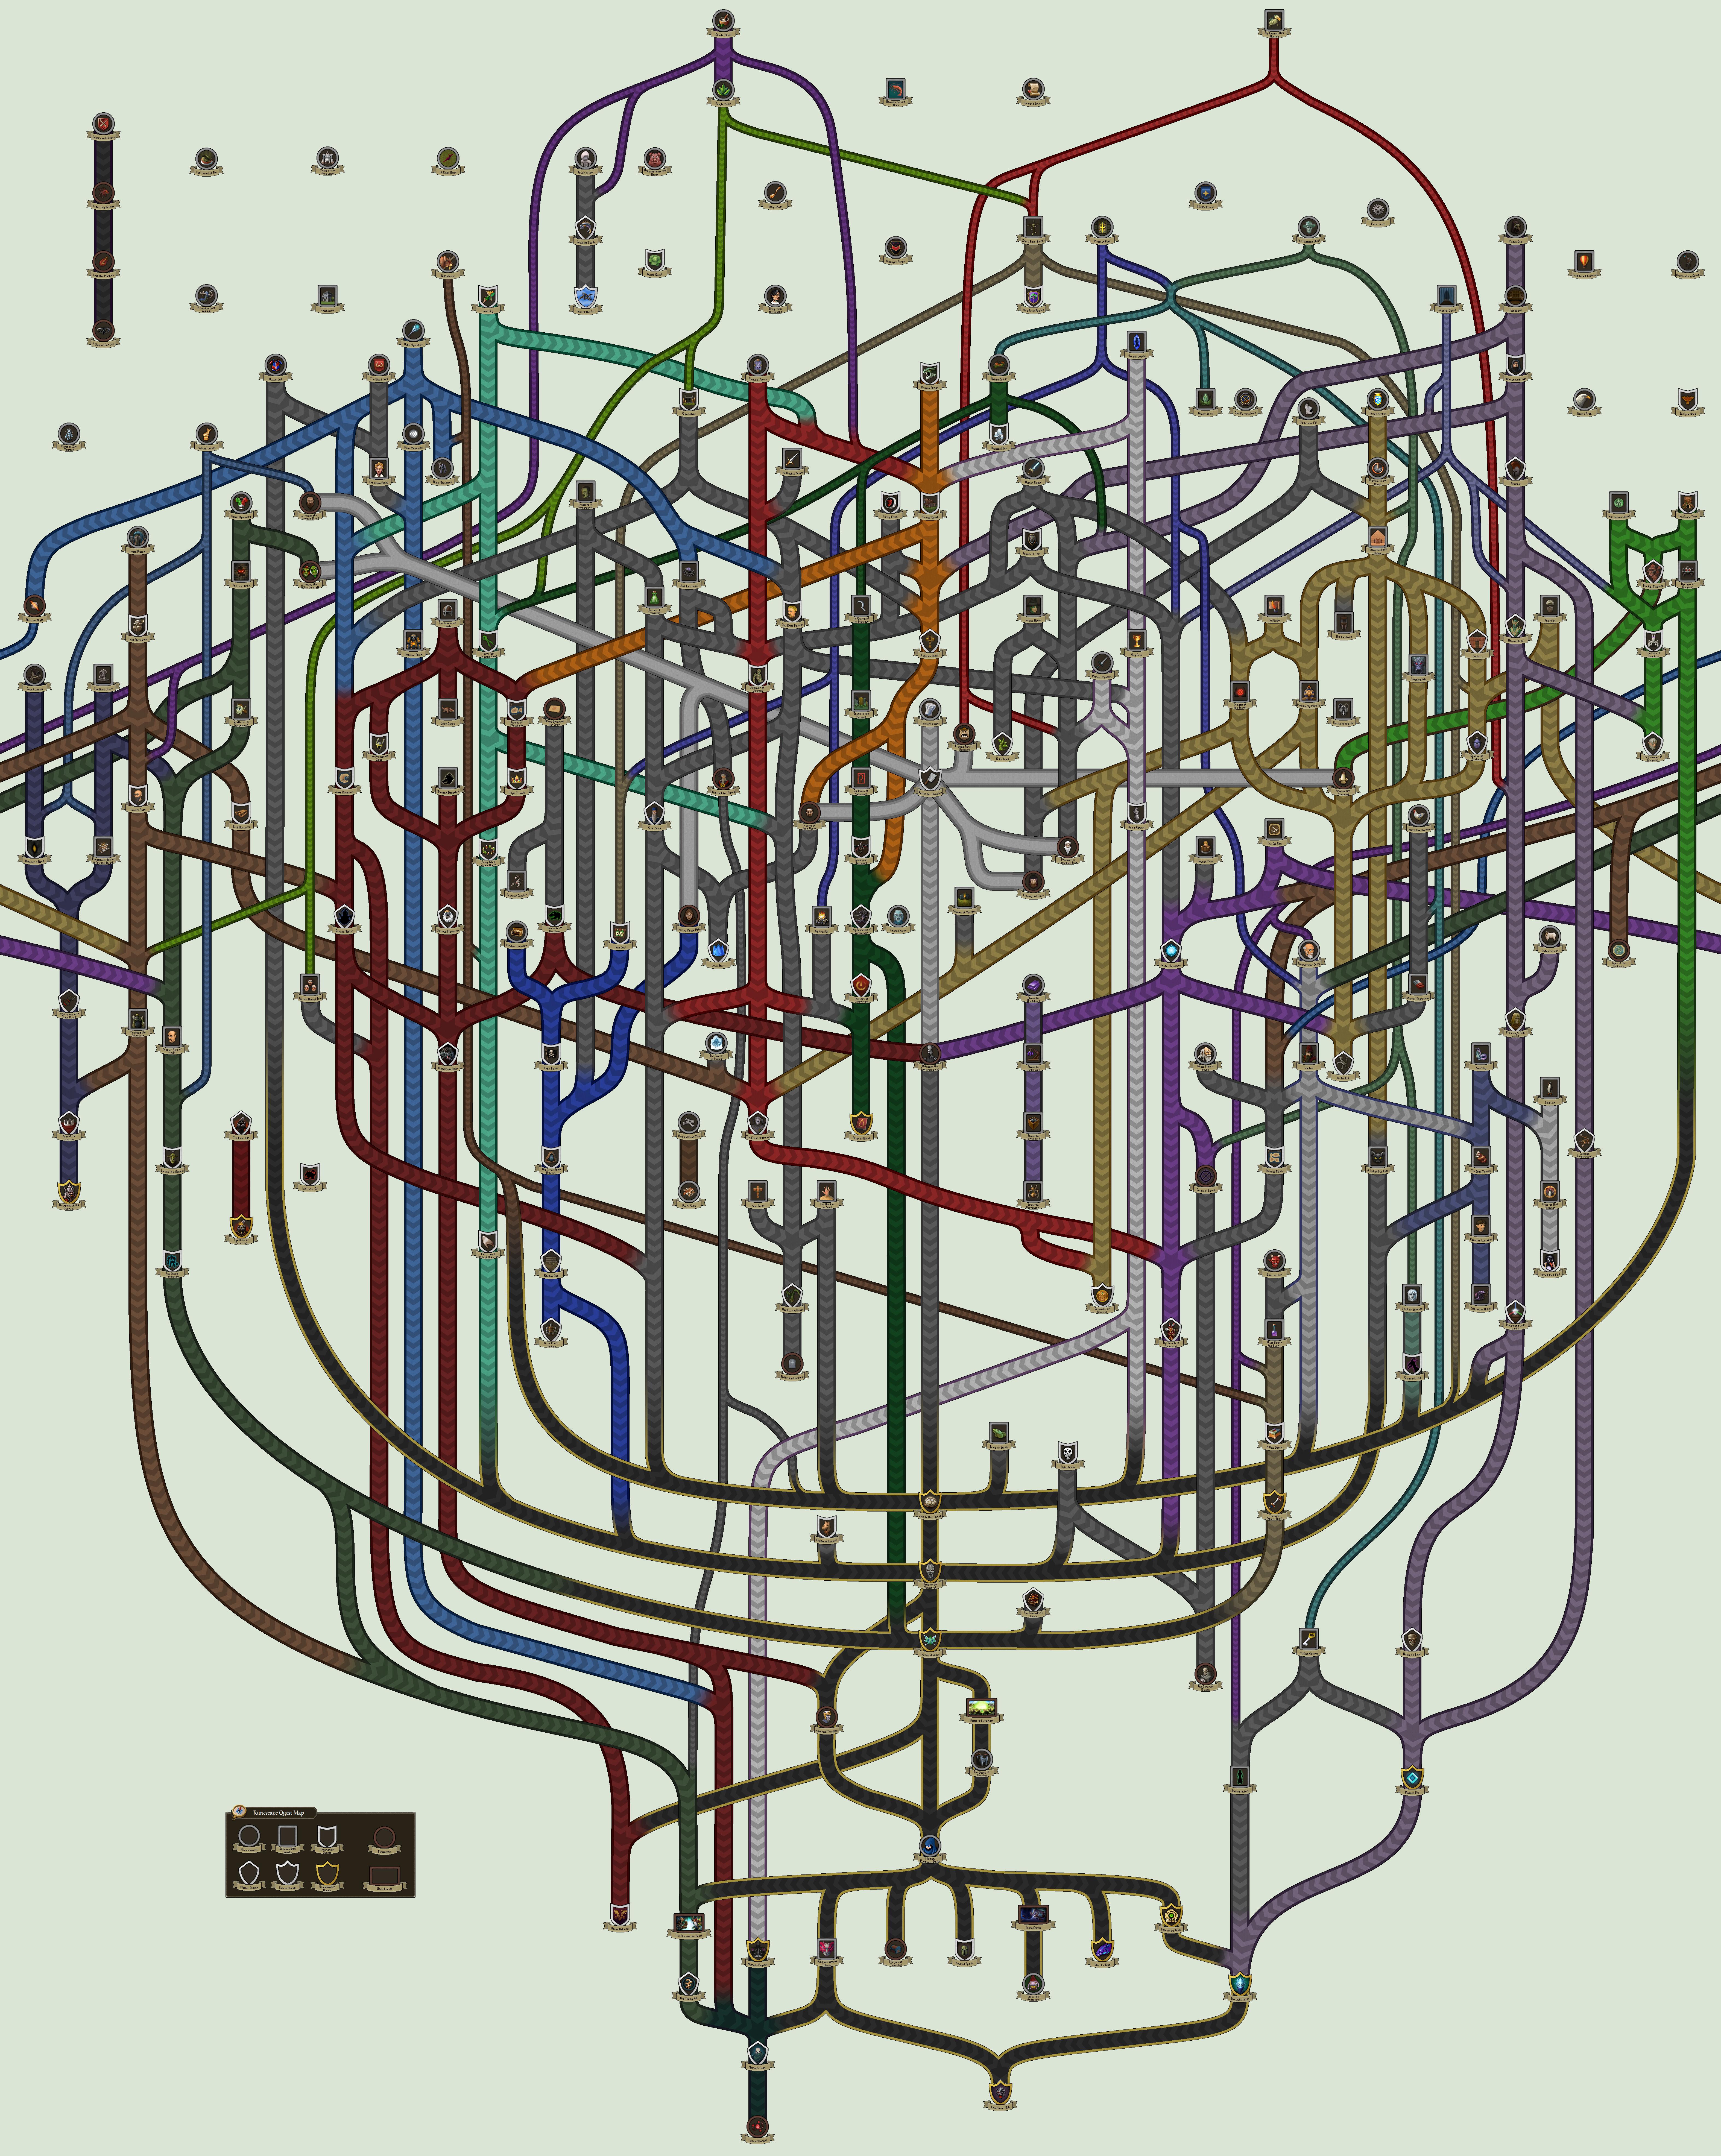 Runescape Quest Map by gamez-x on DeviantArt